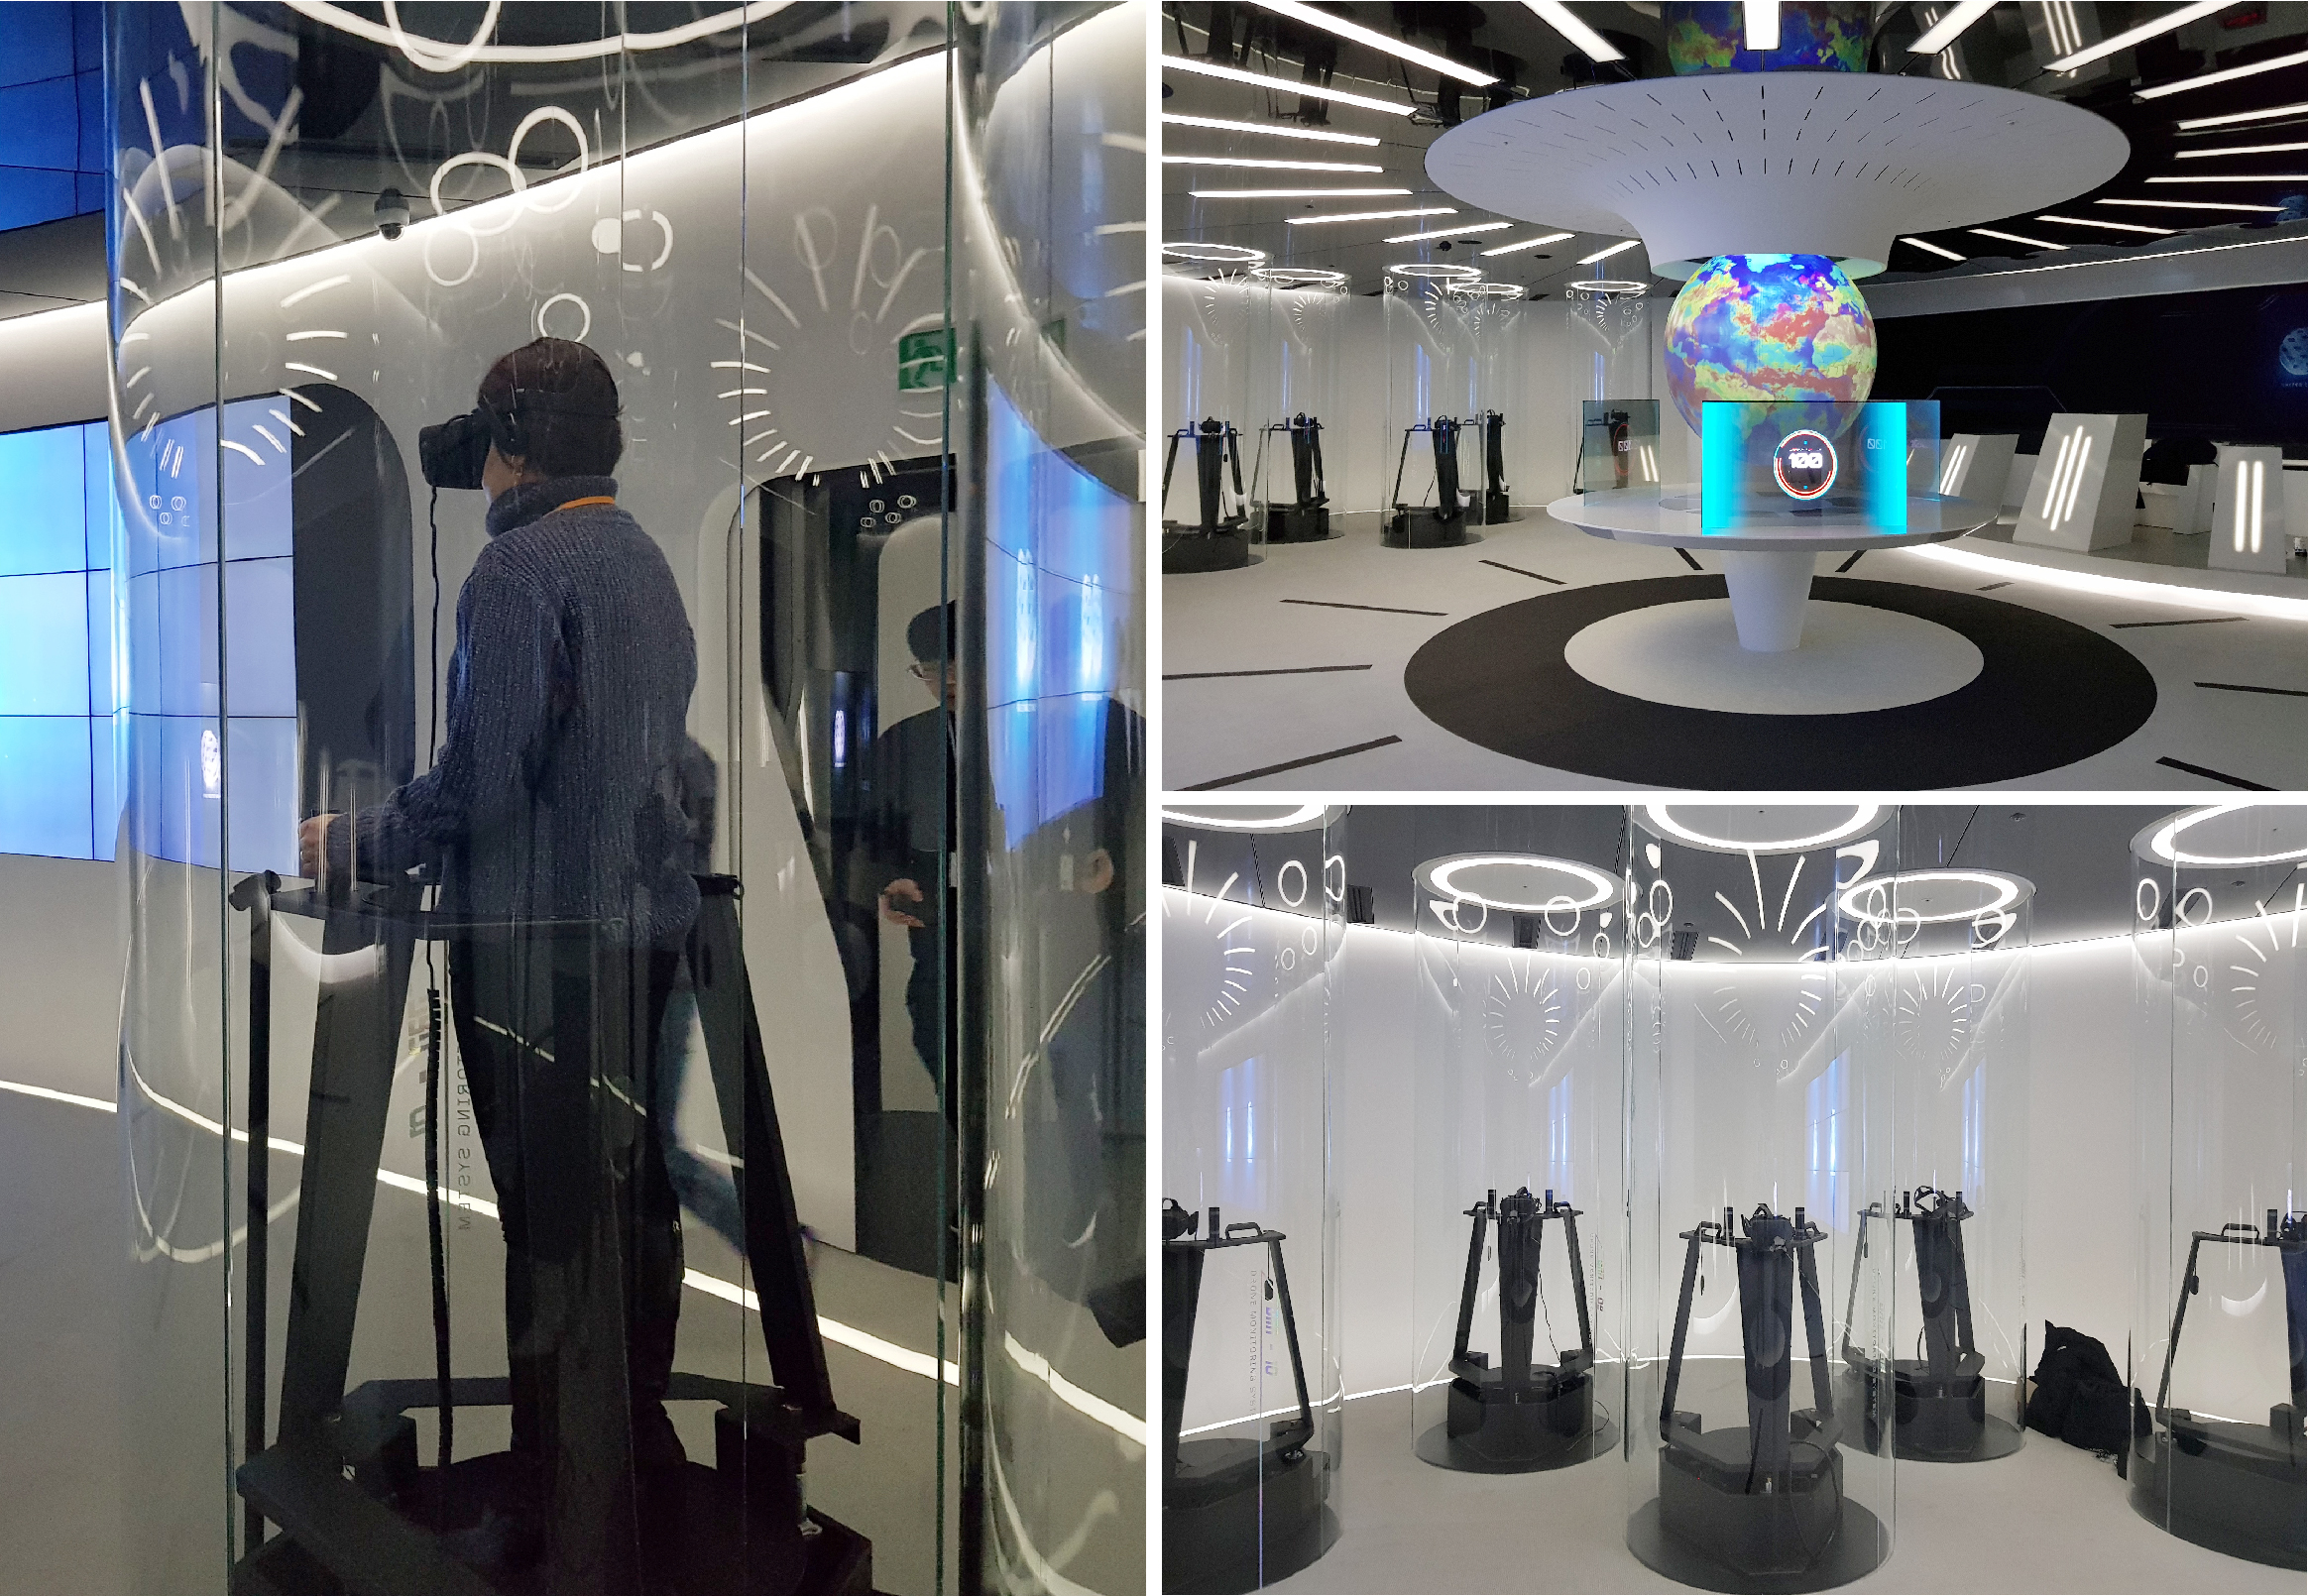 SK T타워 T.um체험관 VR시뮬레이터 제작 설치